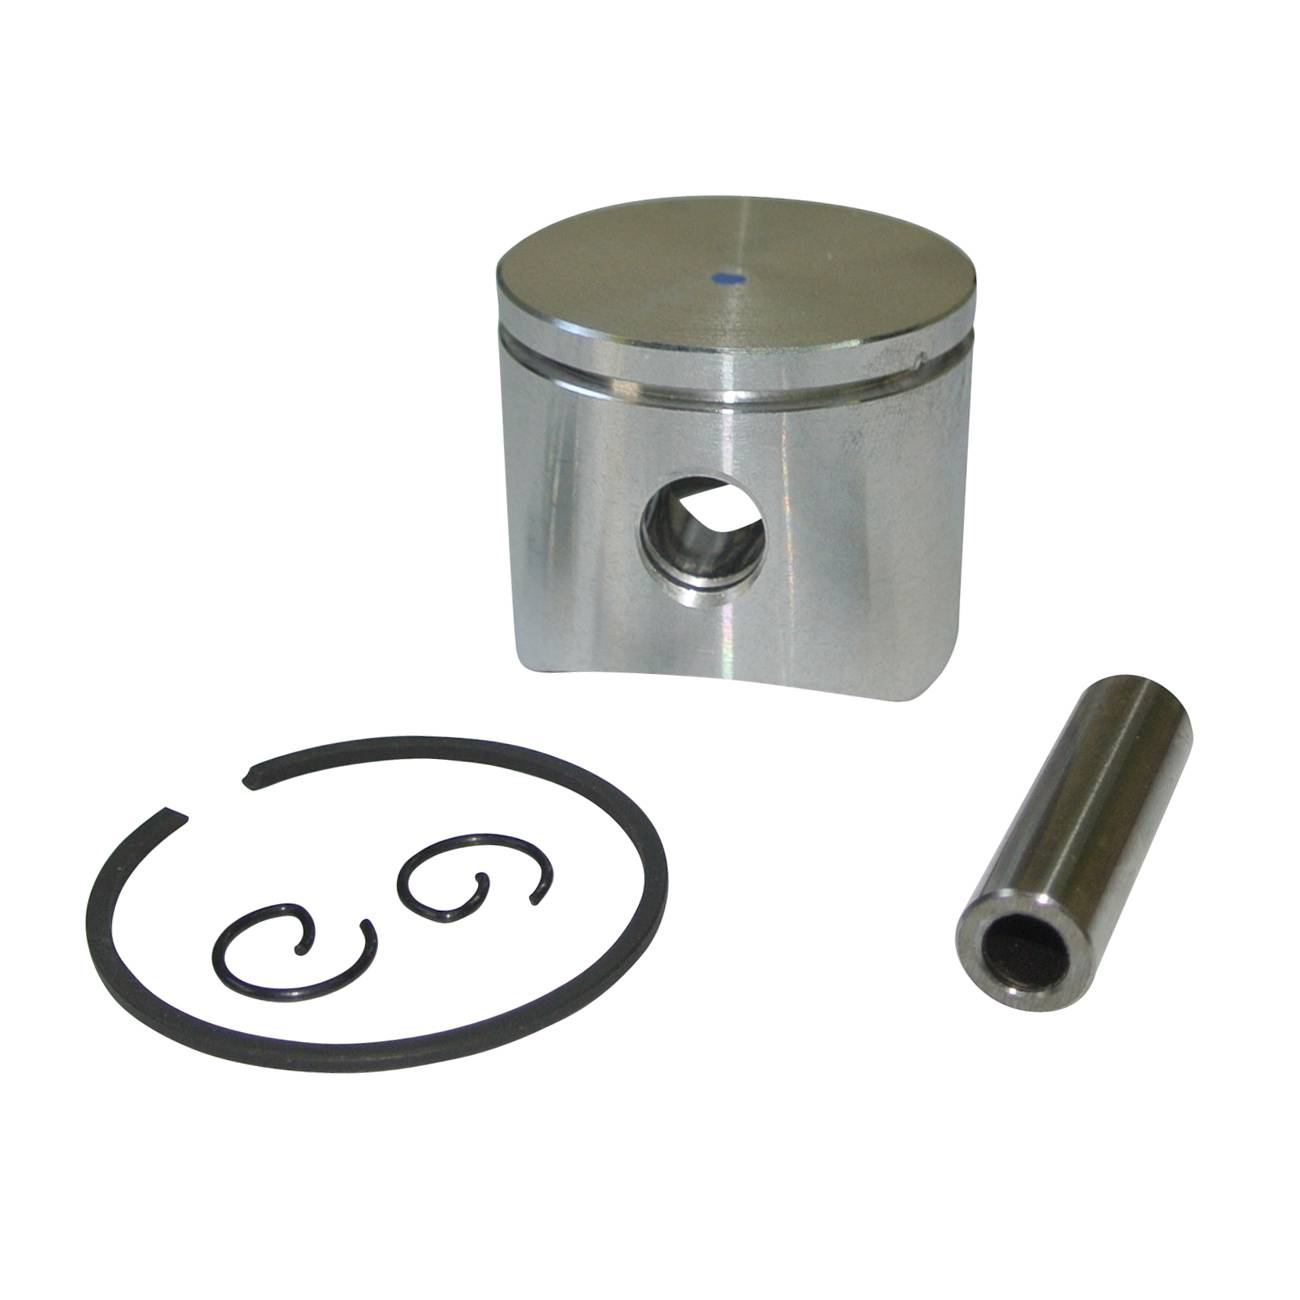 40mm Piston Pin Ring Gasket Bearing For Husqvarna 41 141 142 Chainsaw 530069454